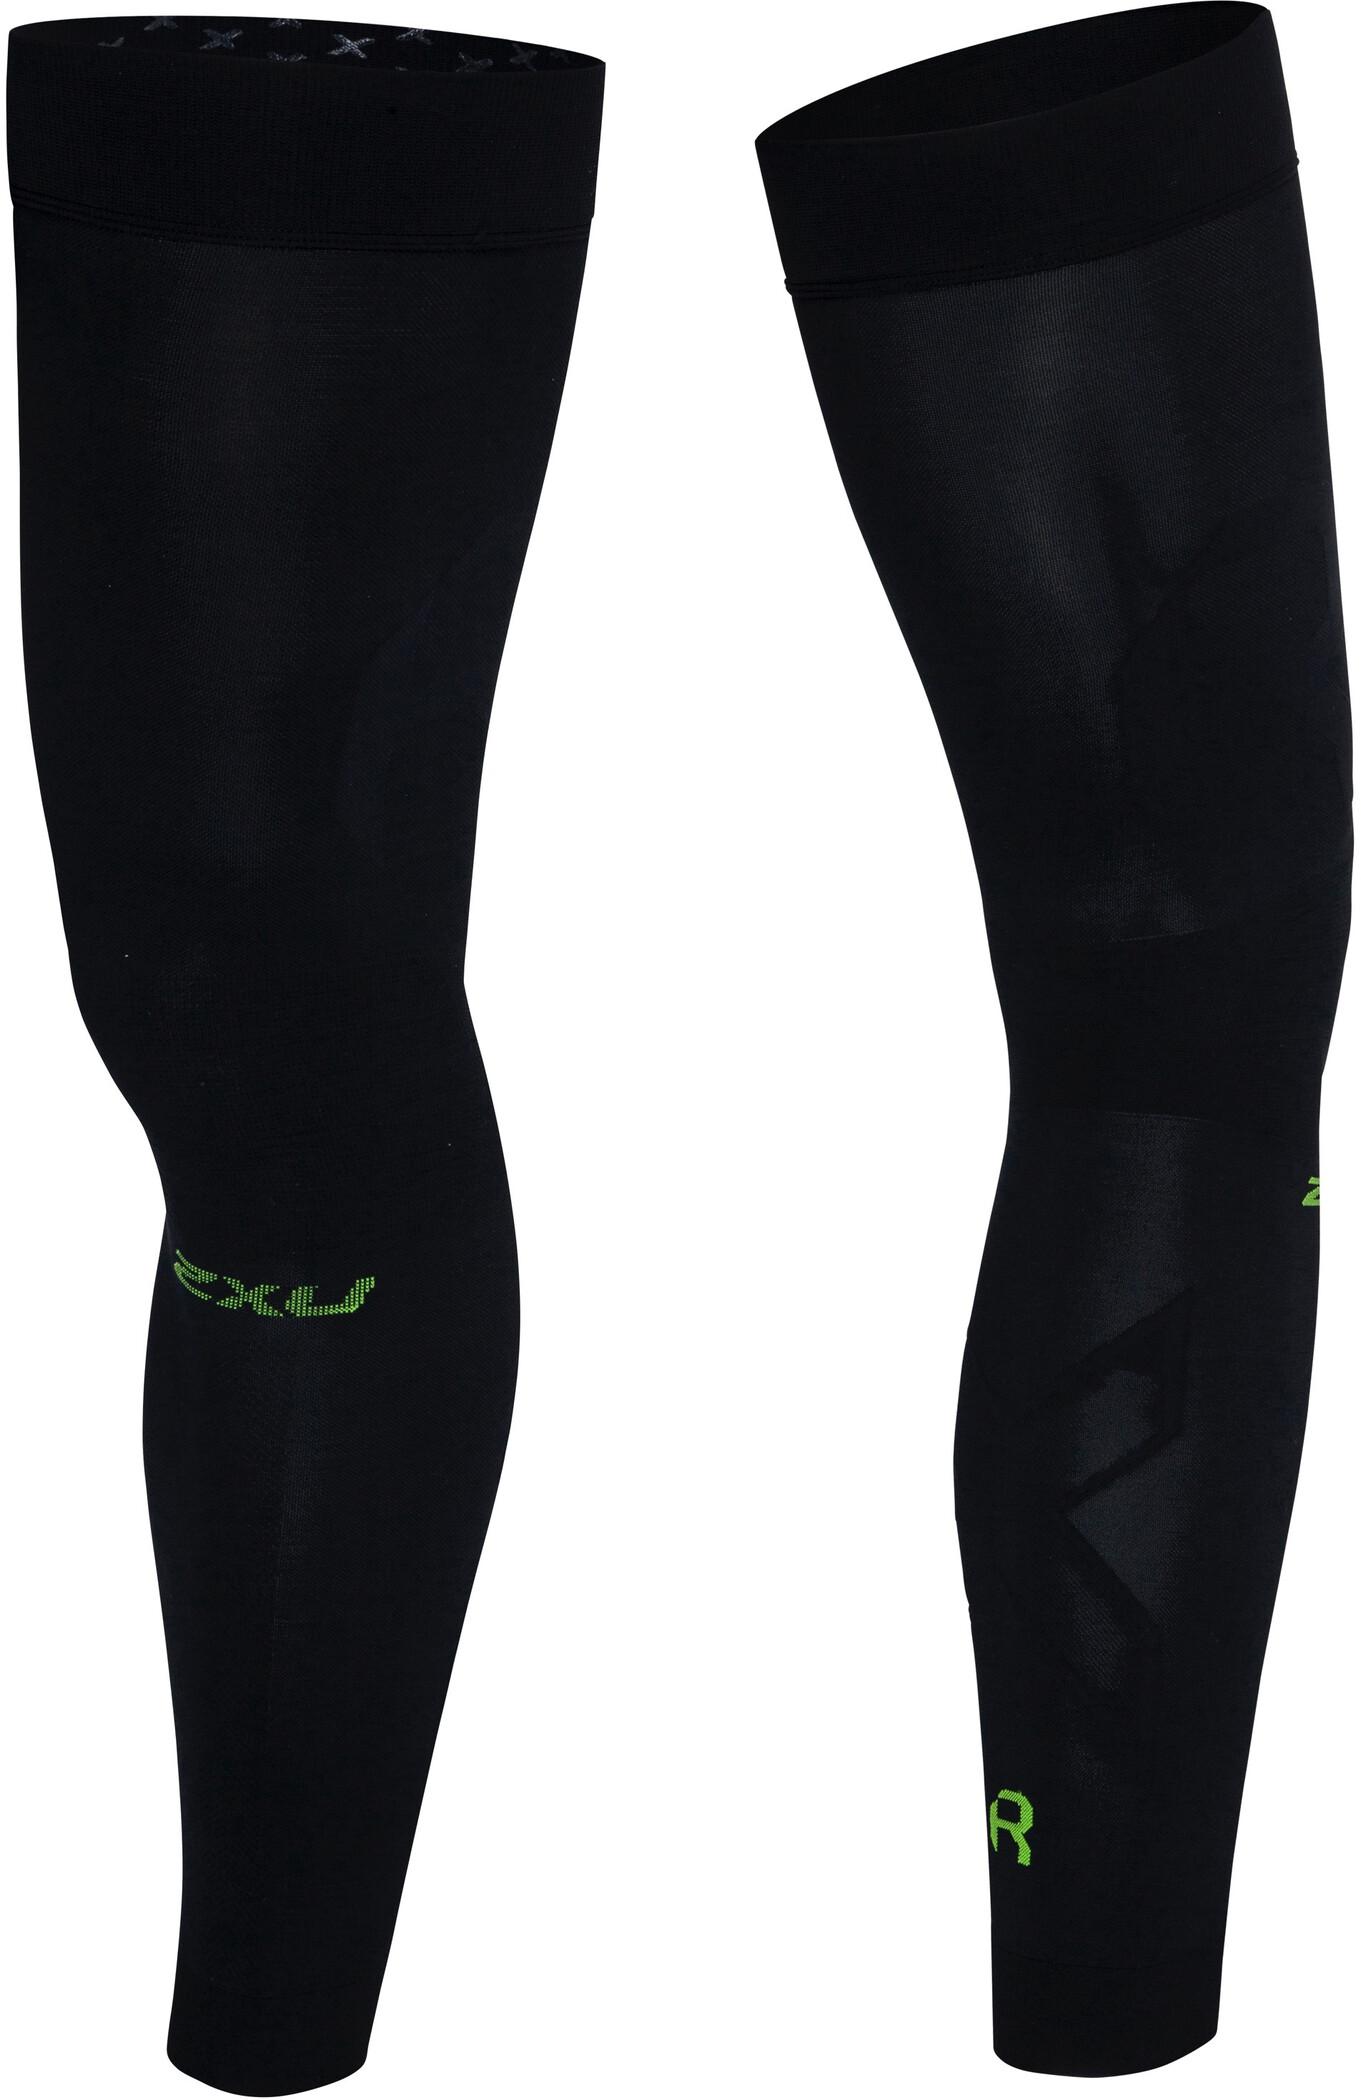 2XU Flex Compression Leg Sleeves for Recovery, black/nero (2019) | Compression